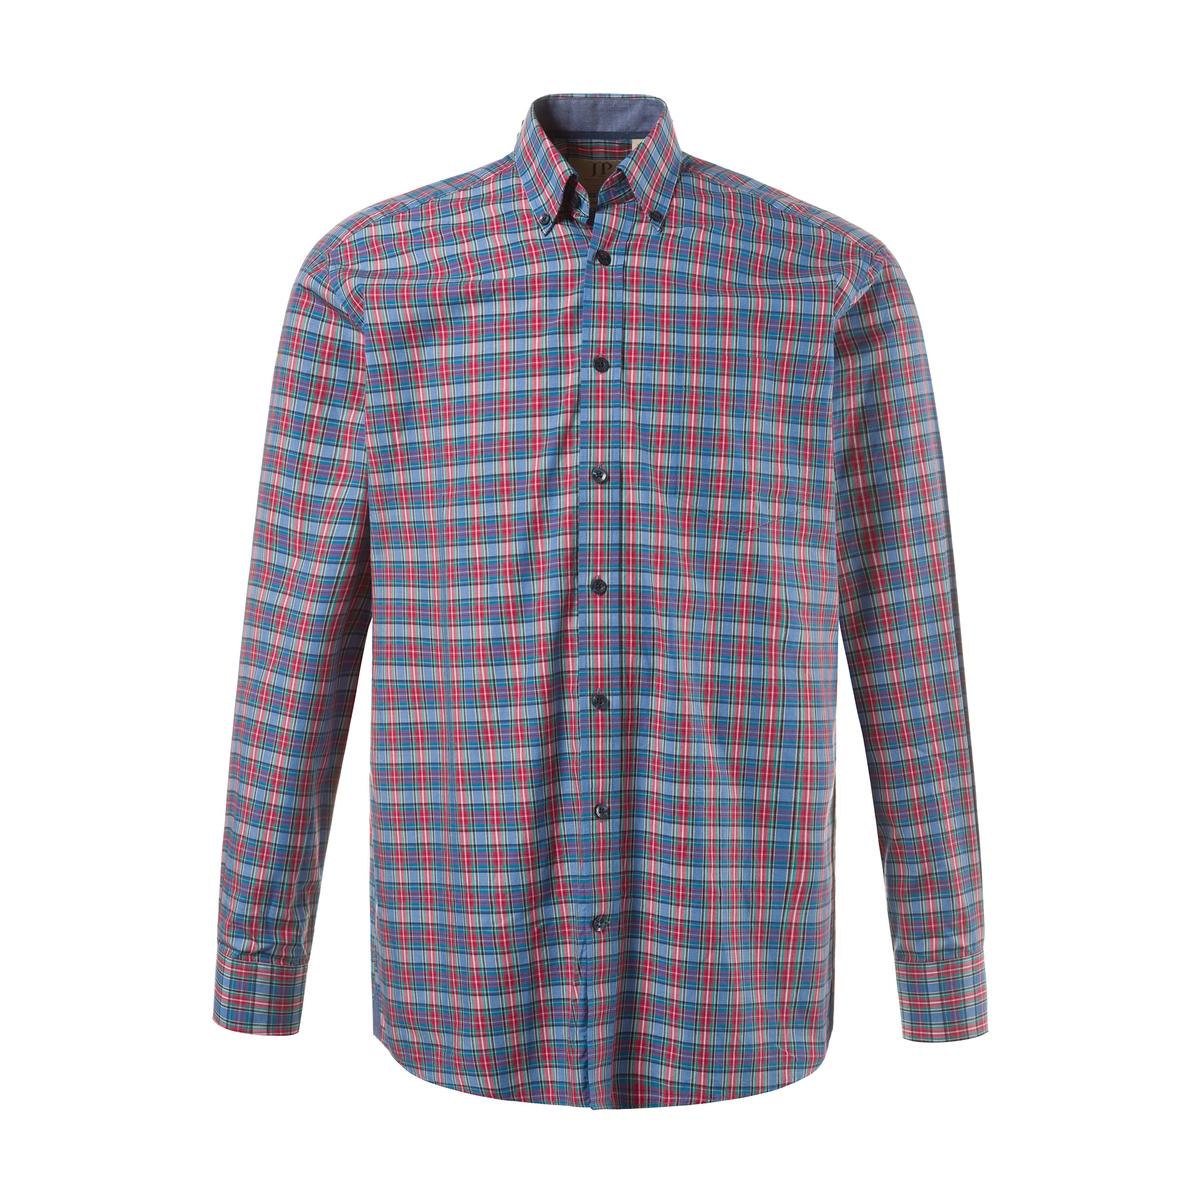 Рубашка<br><br>Цвет: в клетку<br>Размер: L.4XL.5XL.6XL.7XL